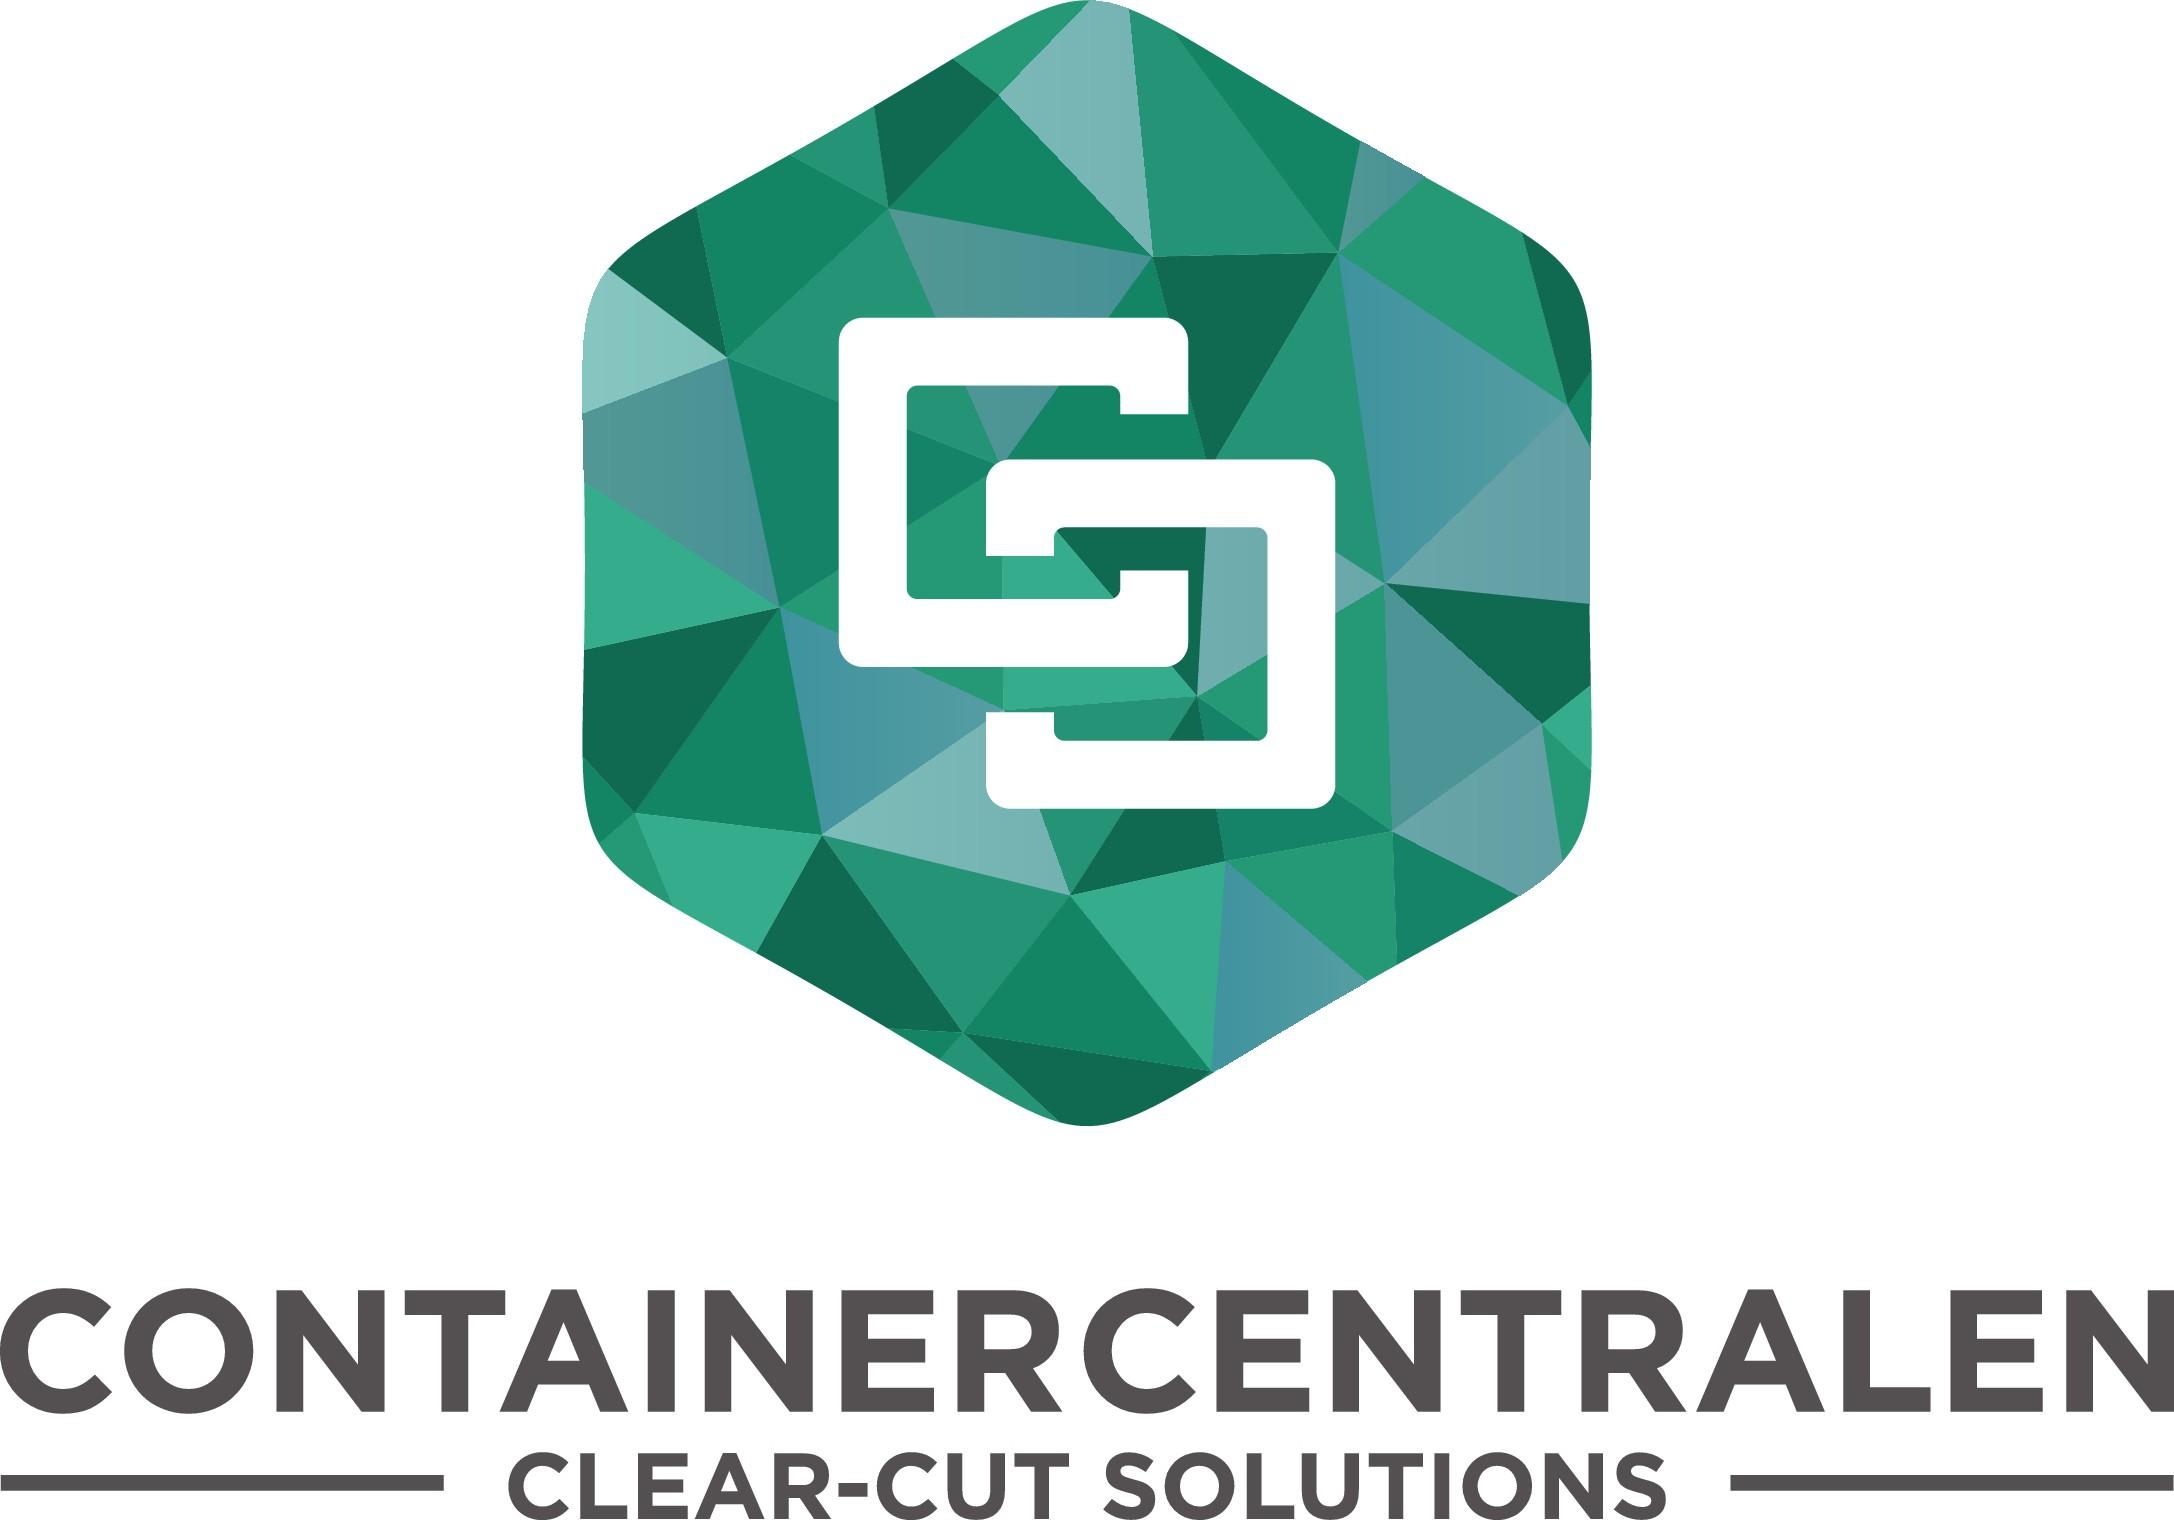 Create a modern, smart, renewed logo for CC